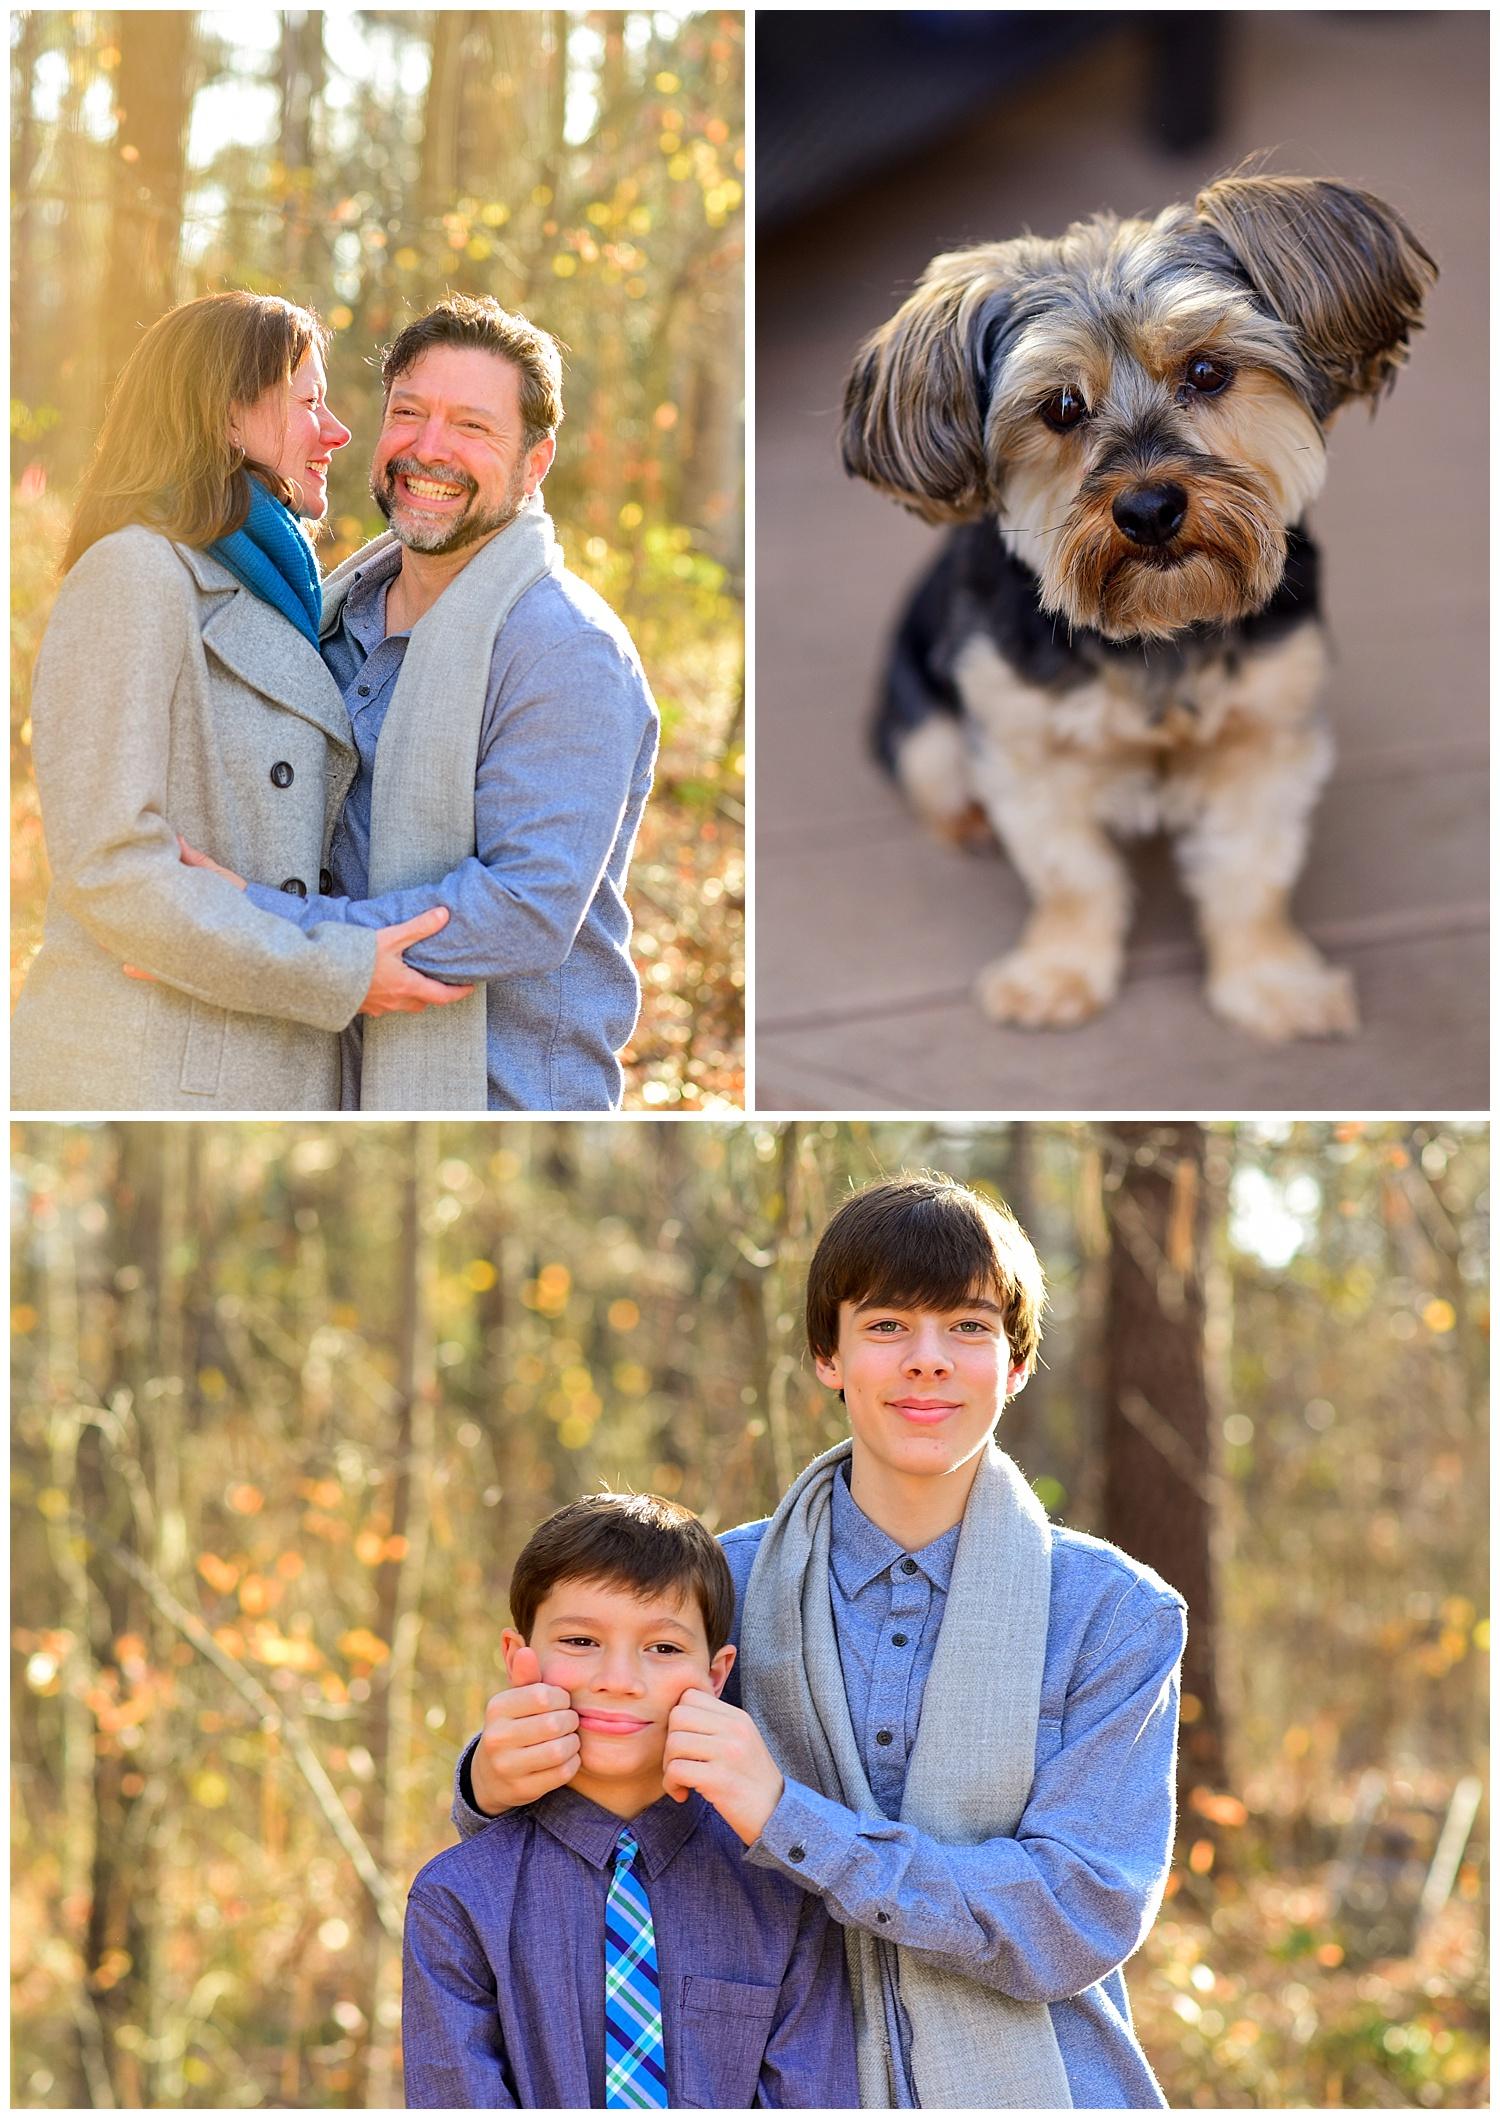 Cary, NC family portraits